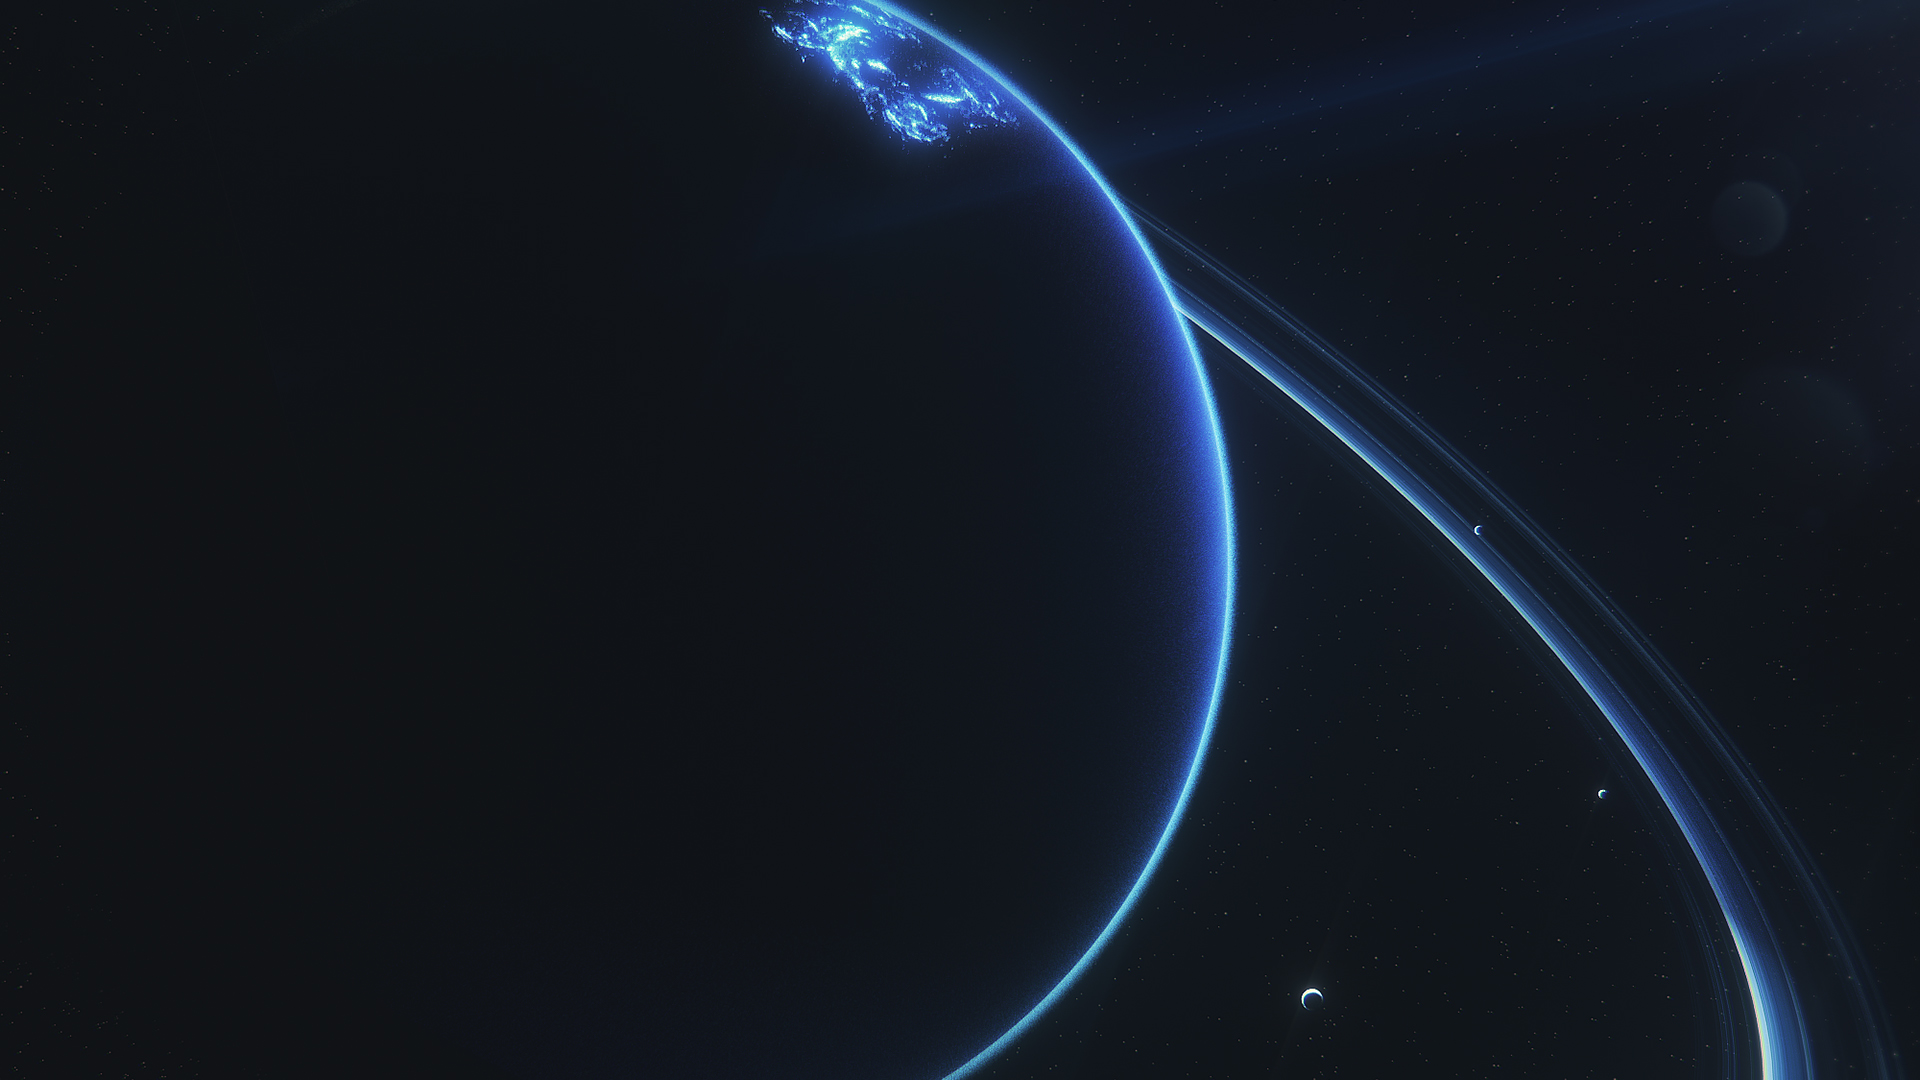 General 1920x1080 space planet planetary rings blue space art digital art